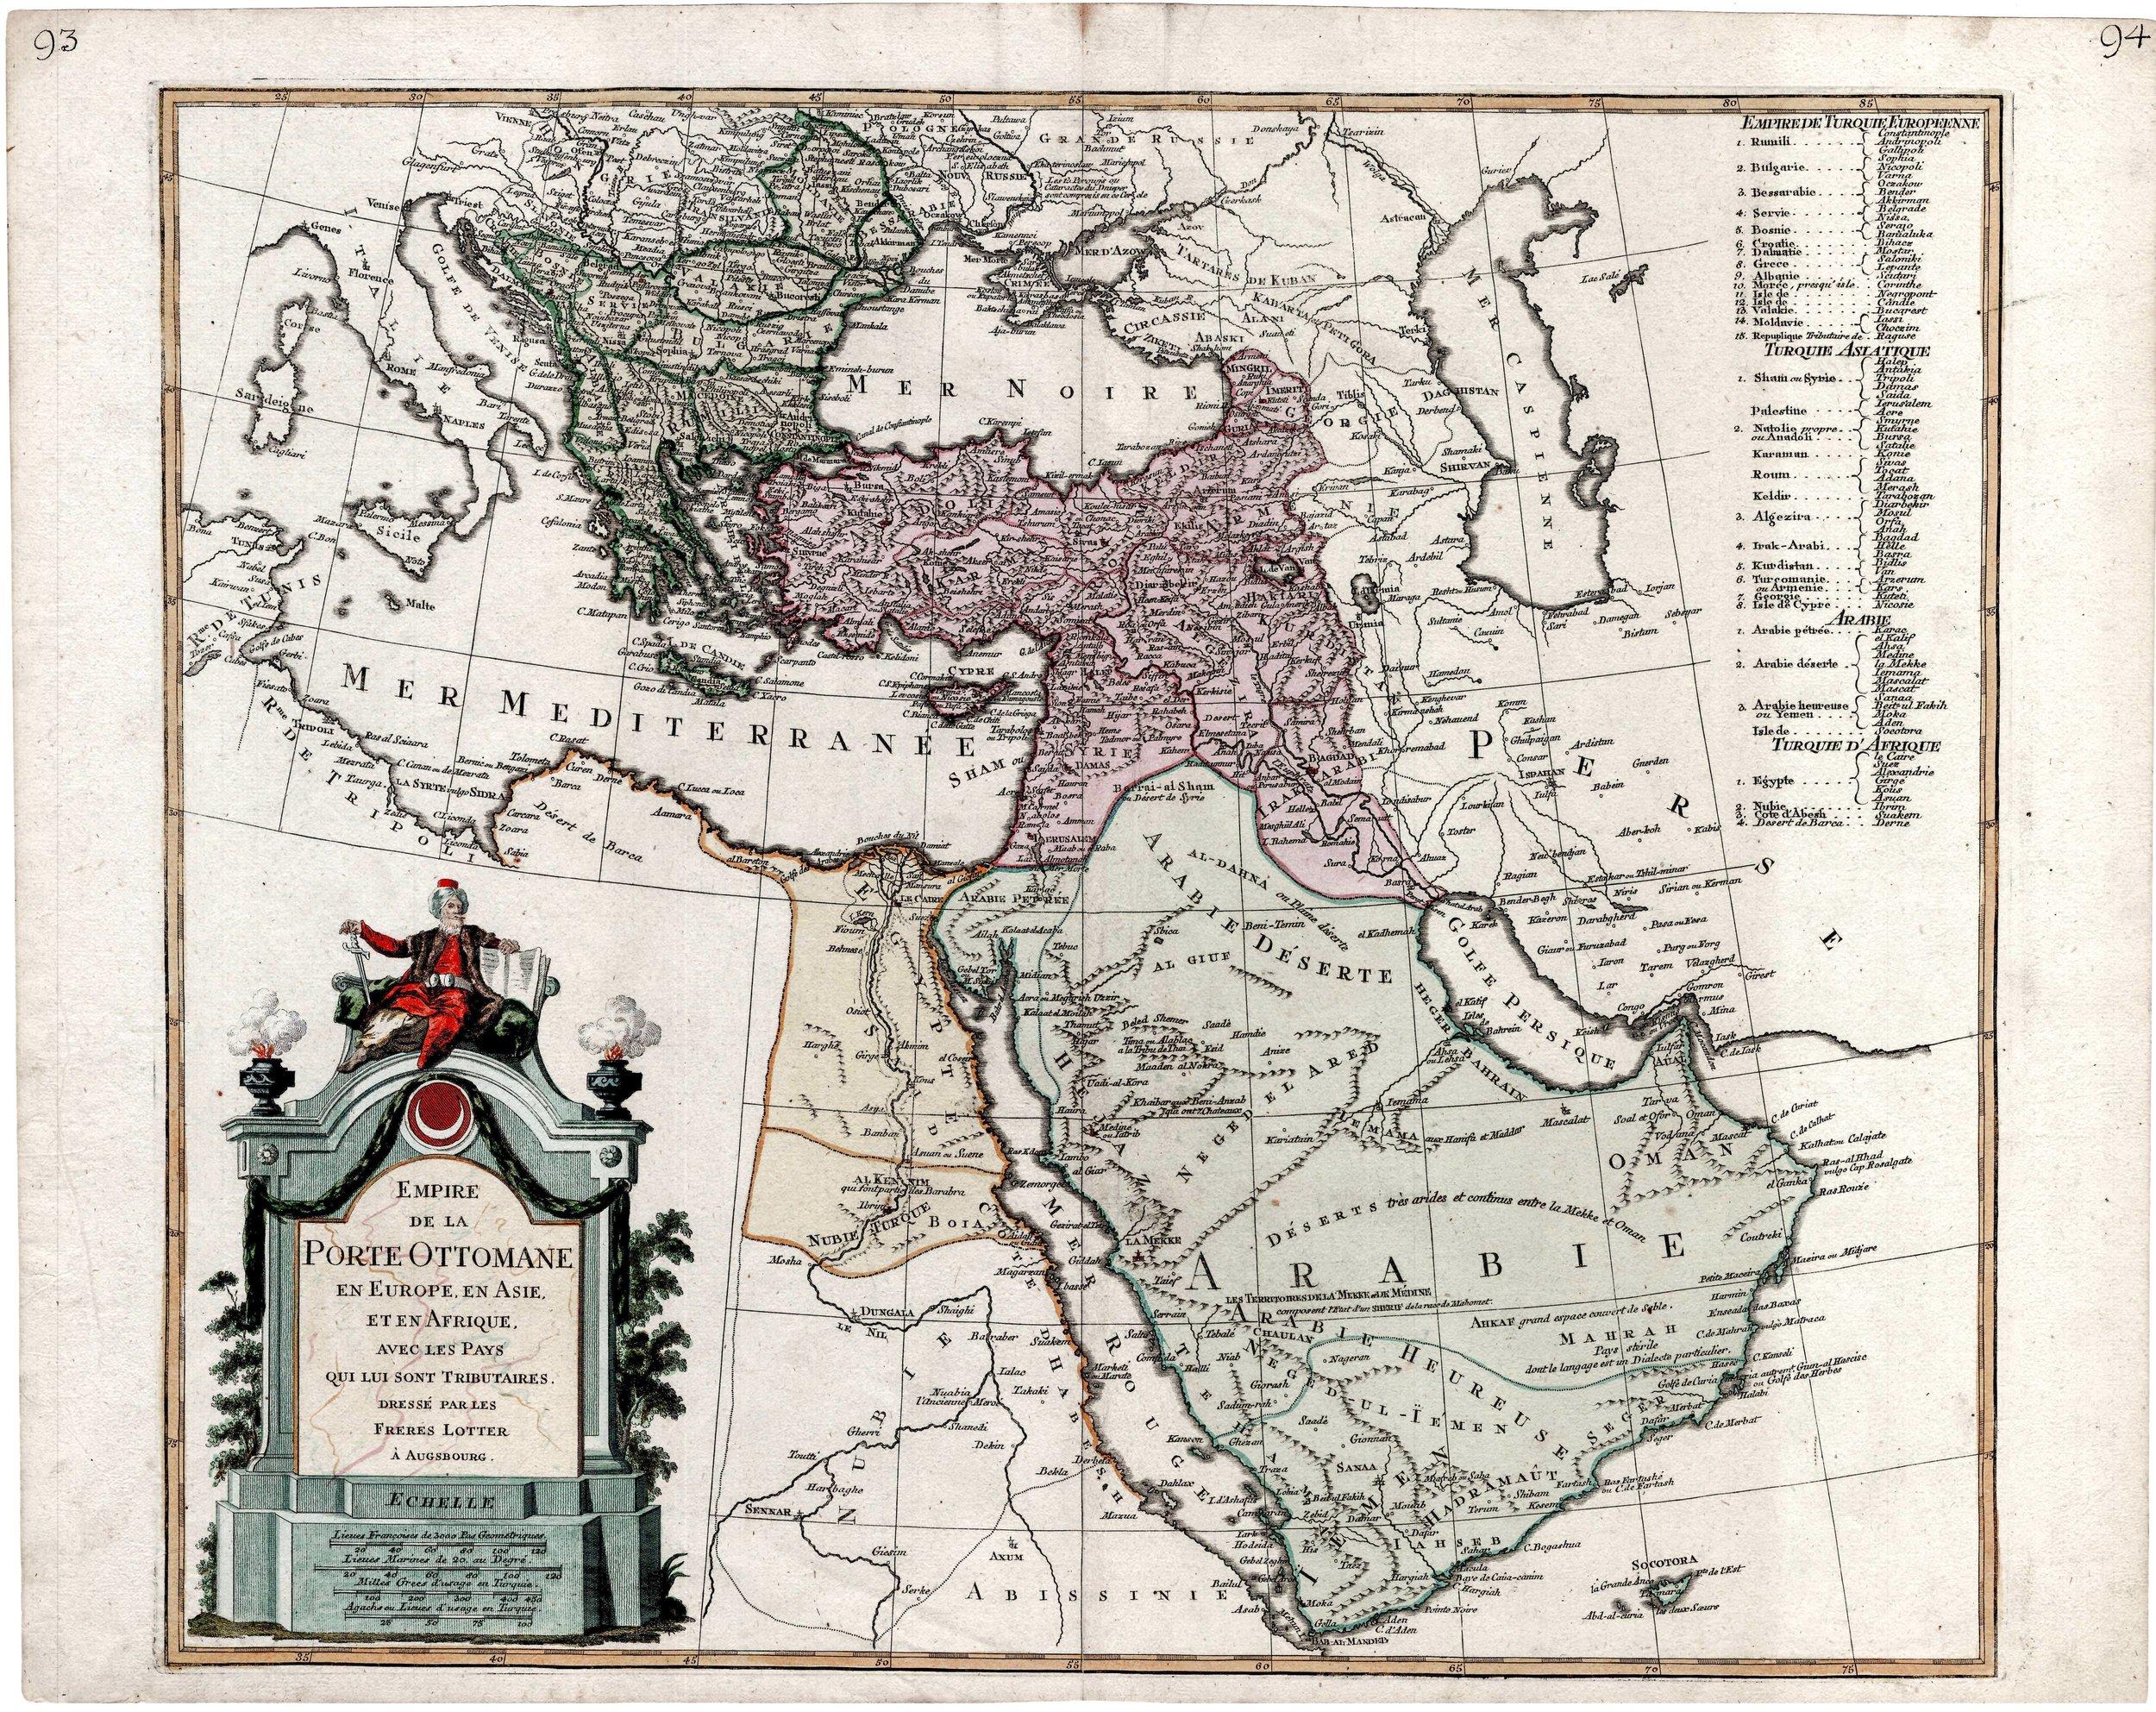 1775 c. - Freres Lotter